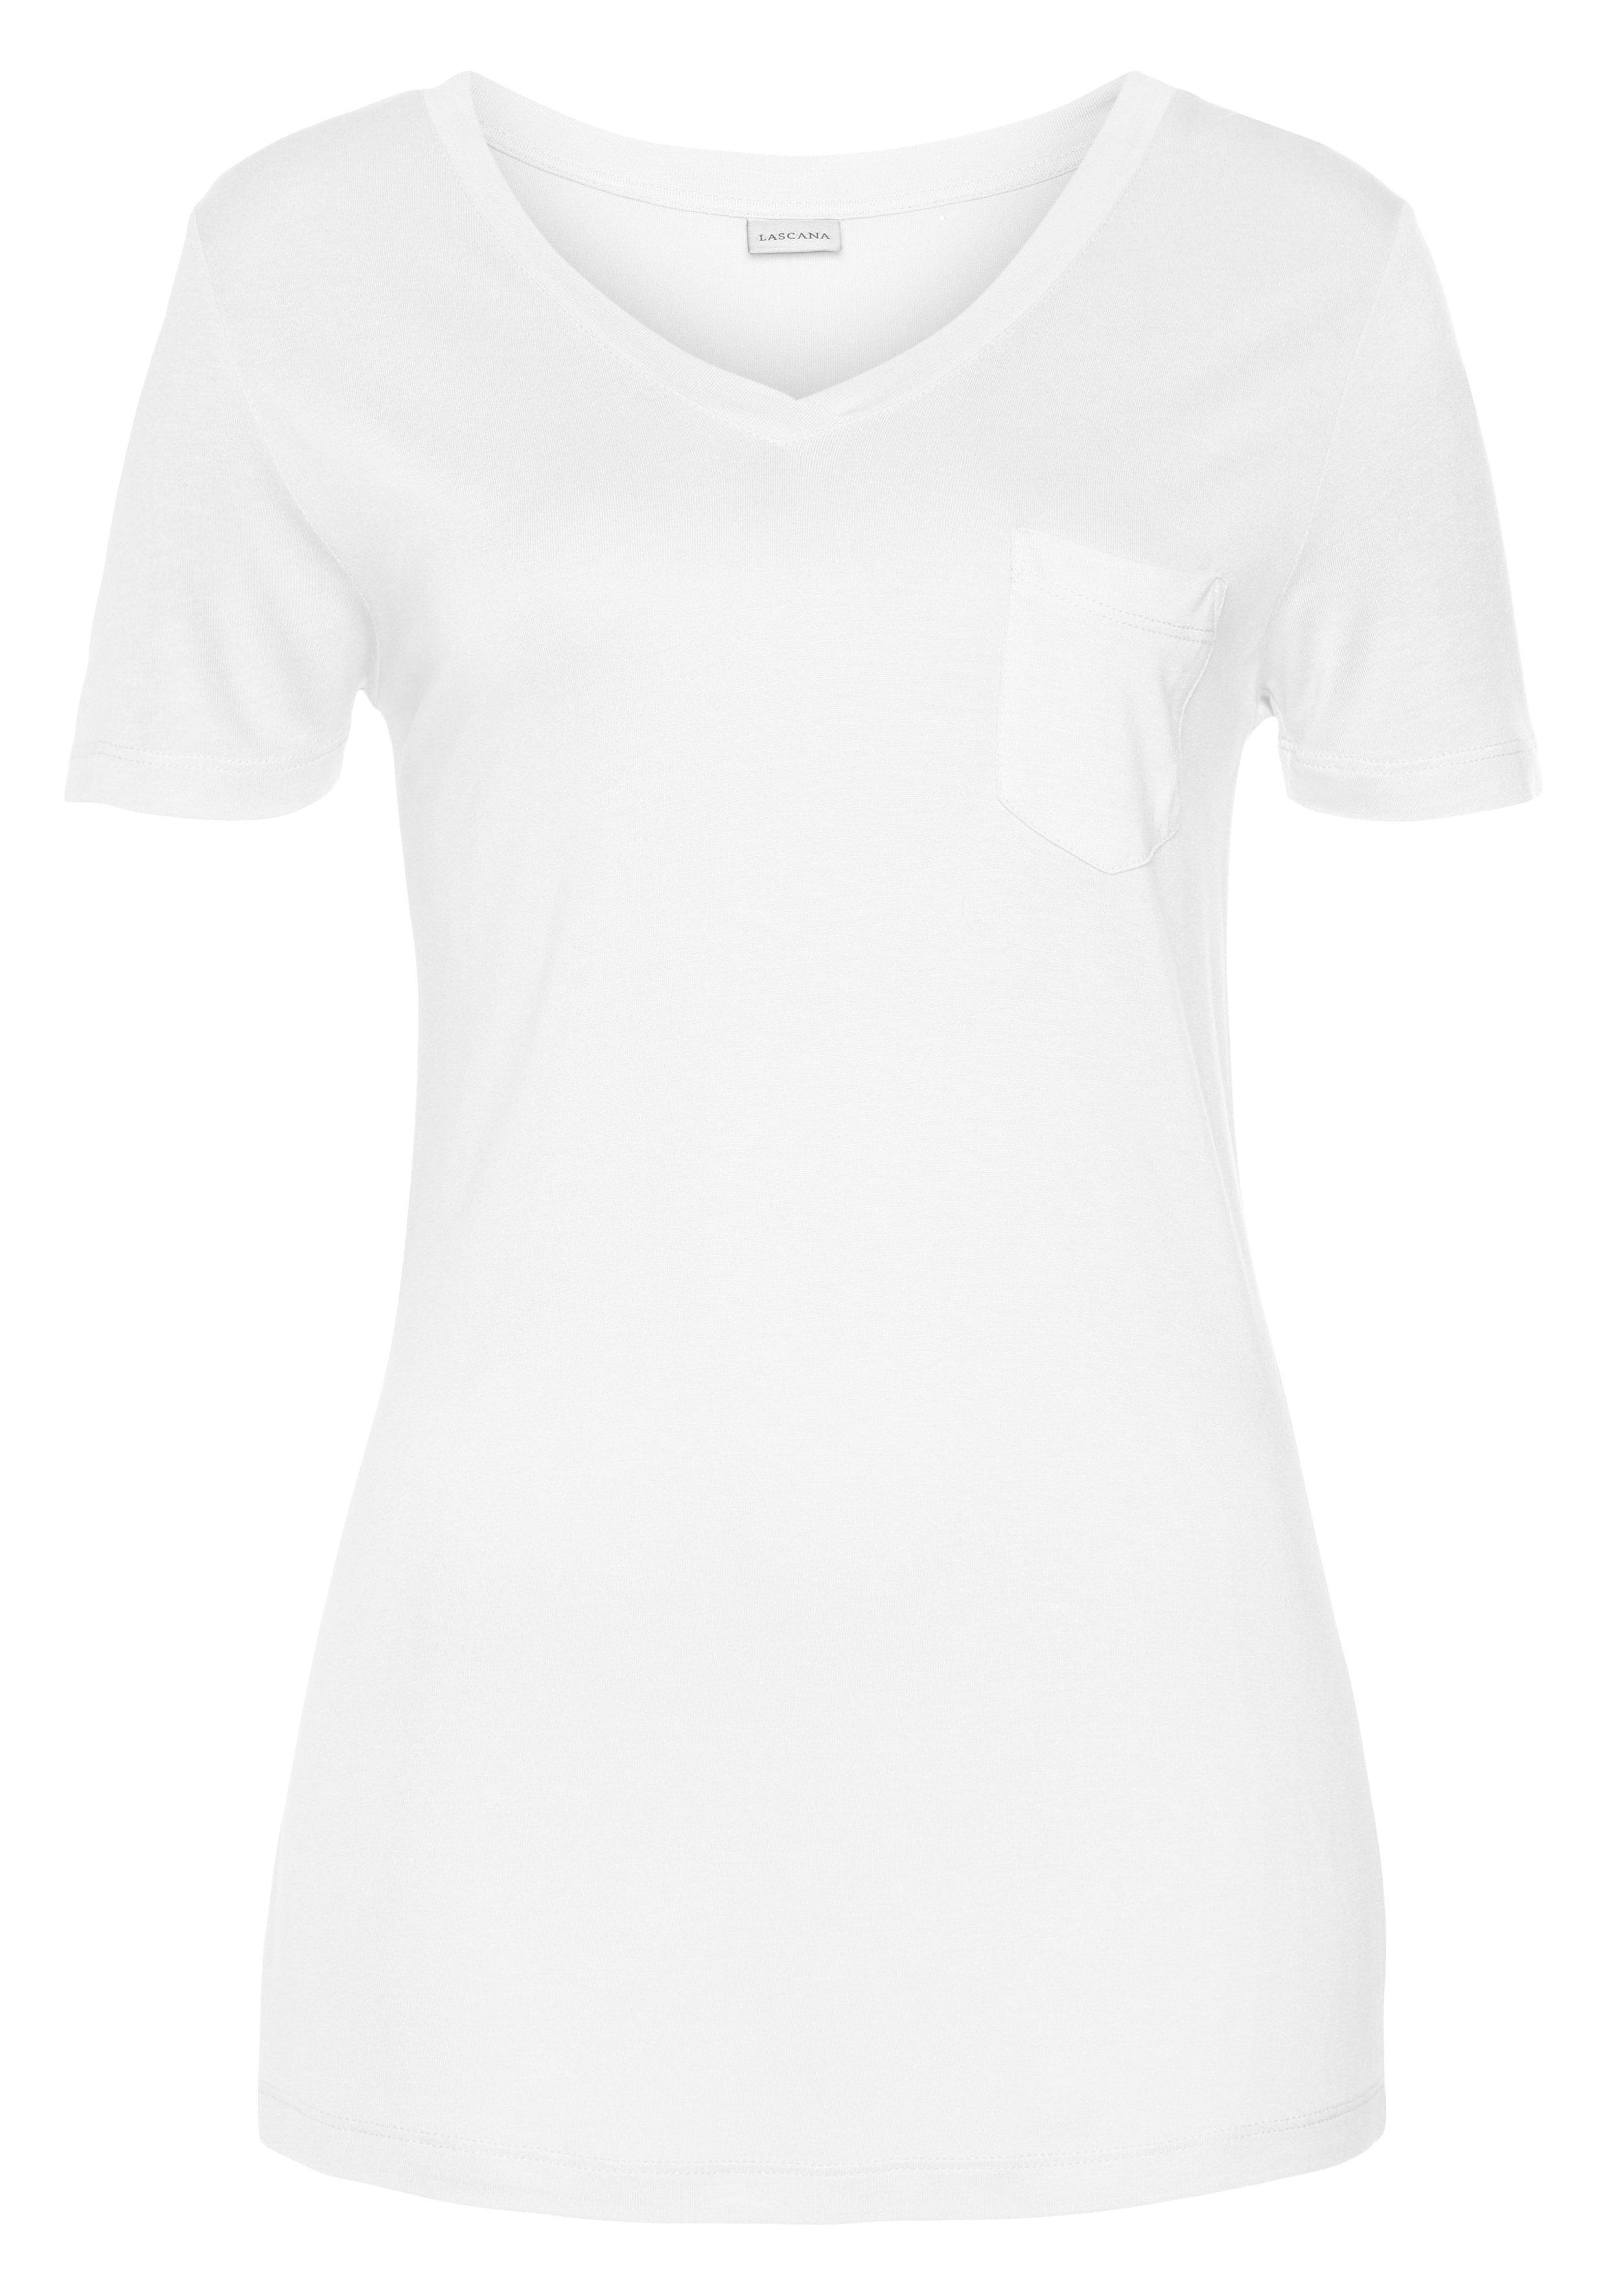 Lascana shirt met V-hals van duurzame viscose goedkoop op lascana.nl kopen